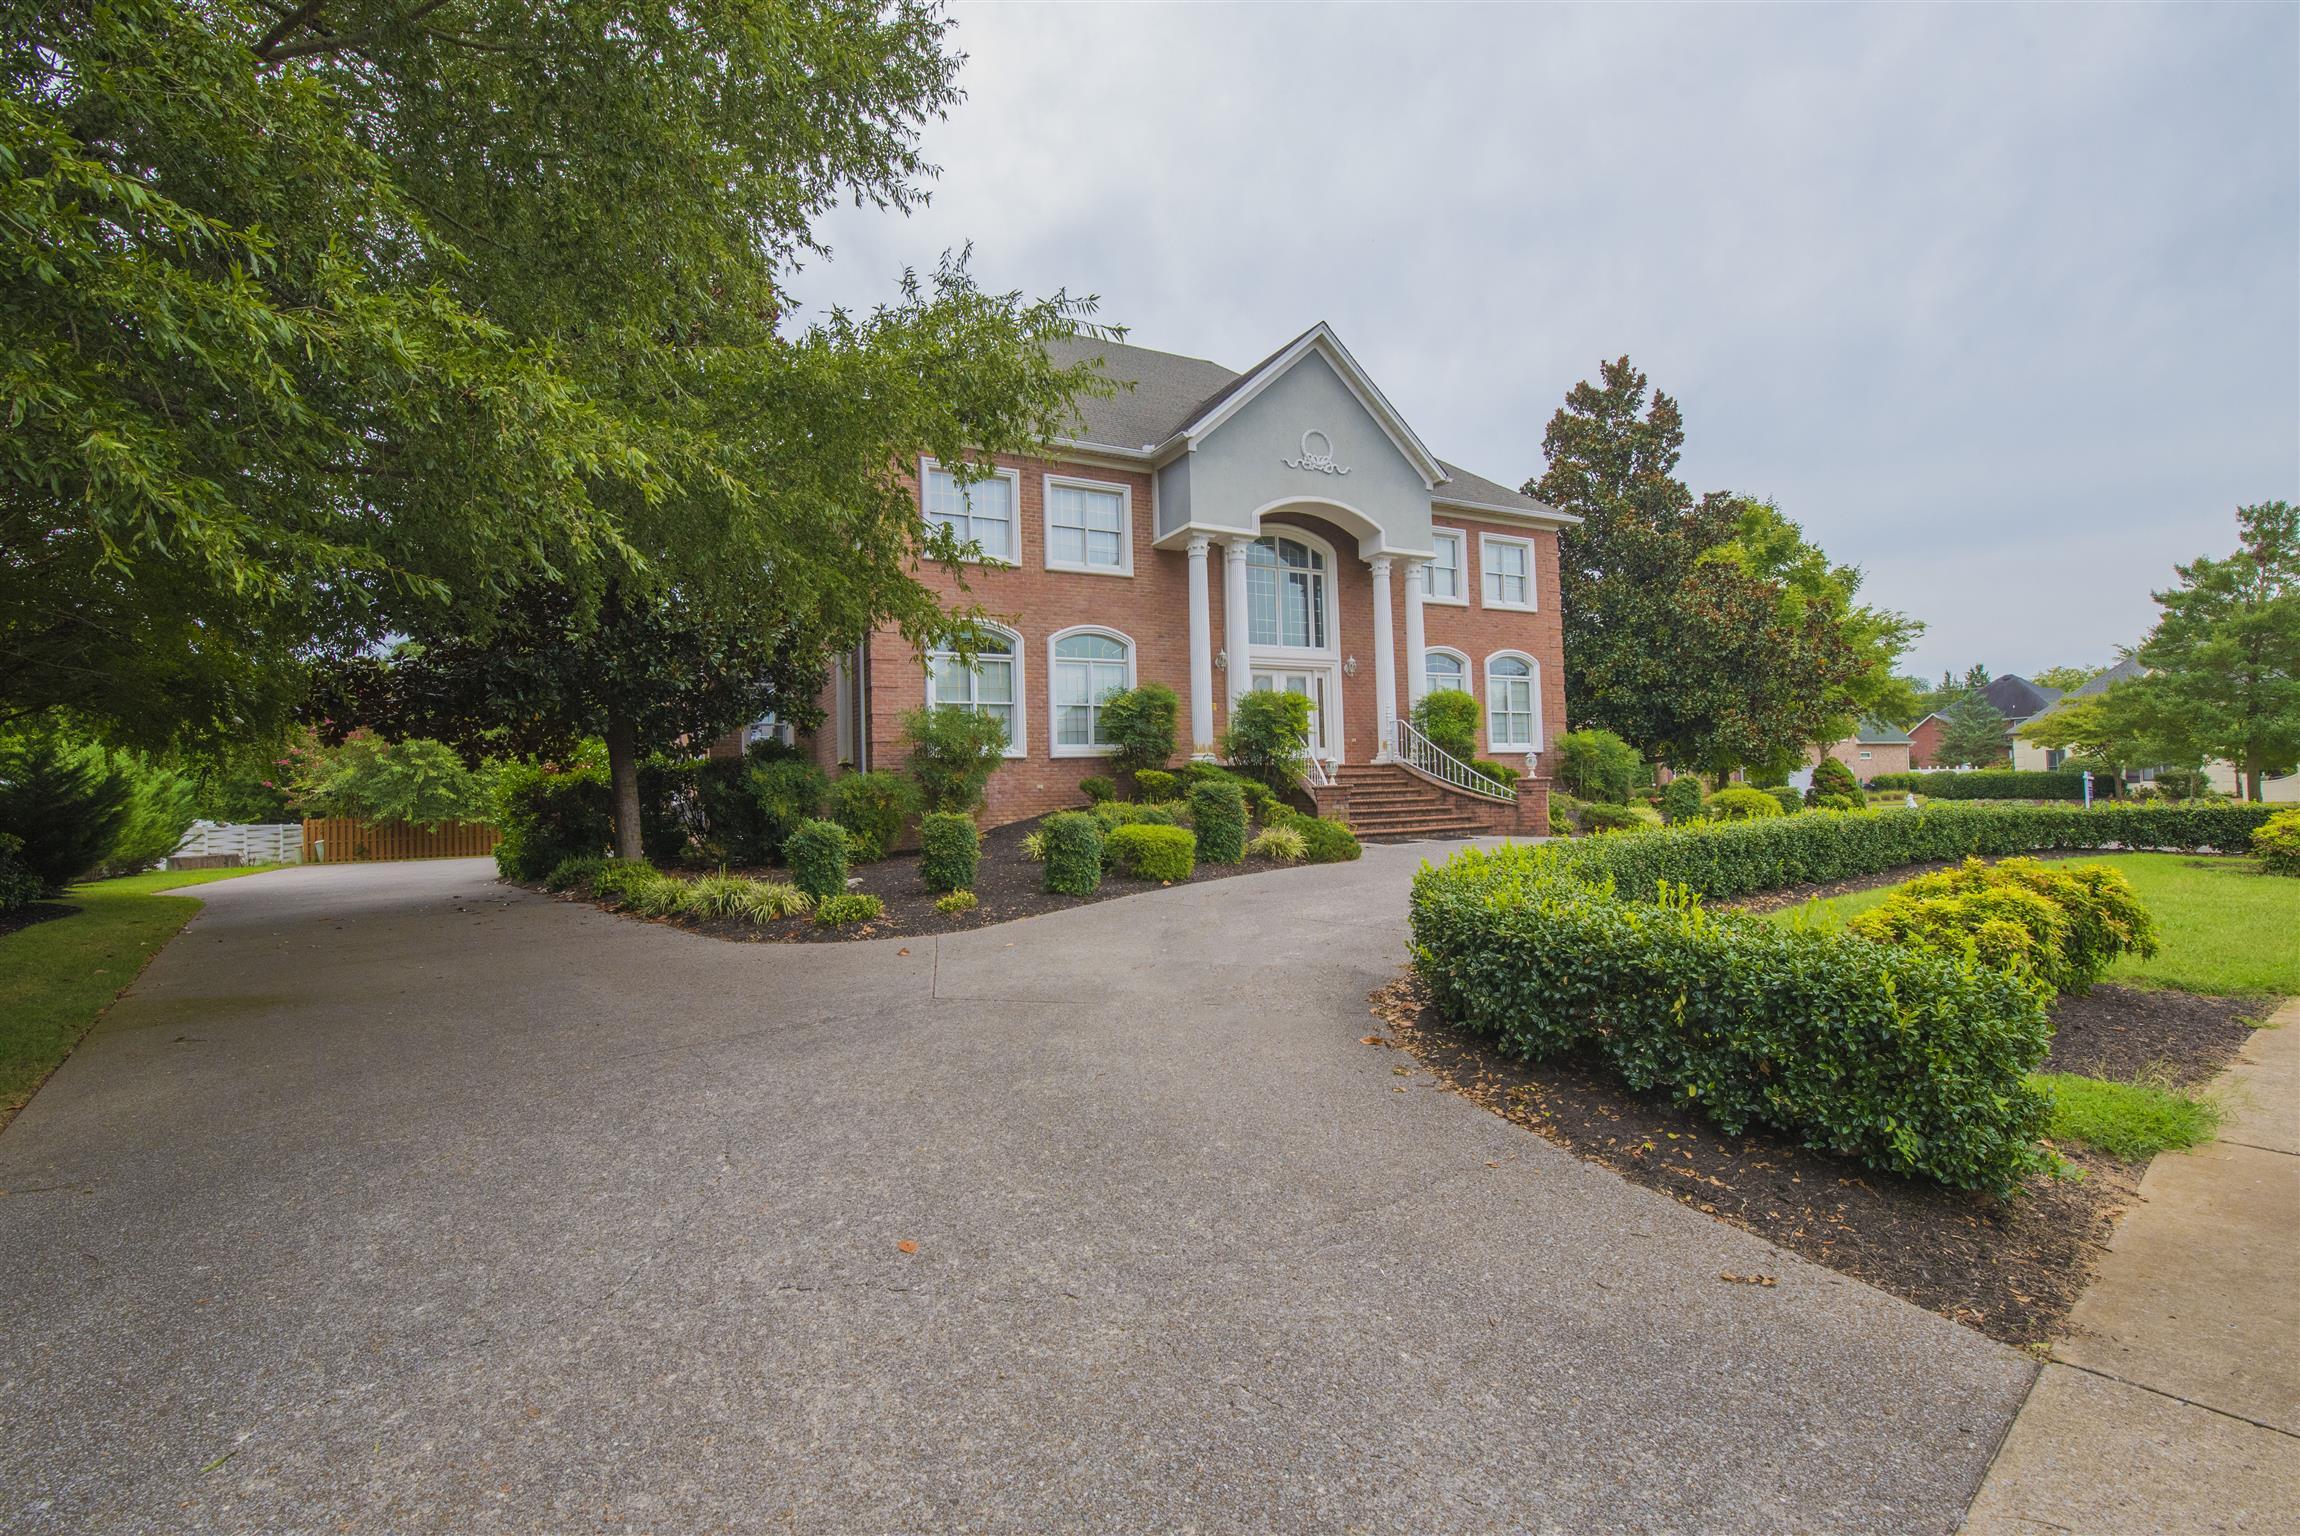 2902 Princeton Ln, Murfreesboro, TN 37130 - Murfreesboro, TN real estate listing